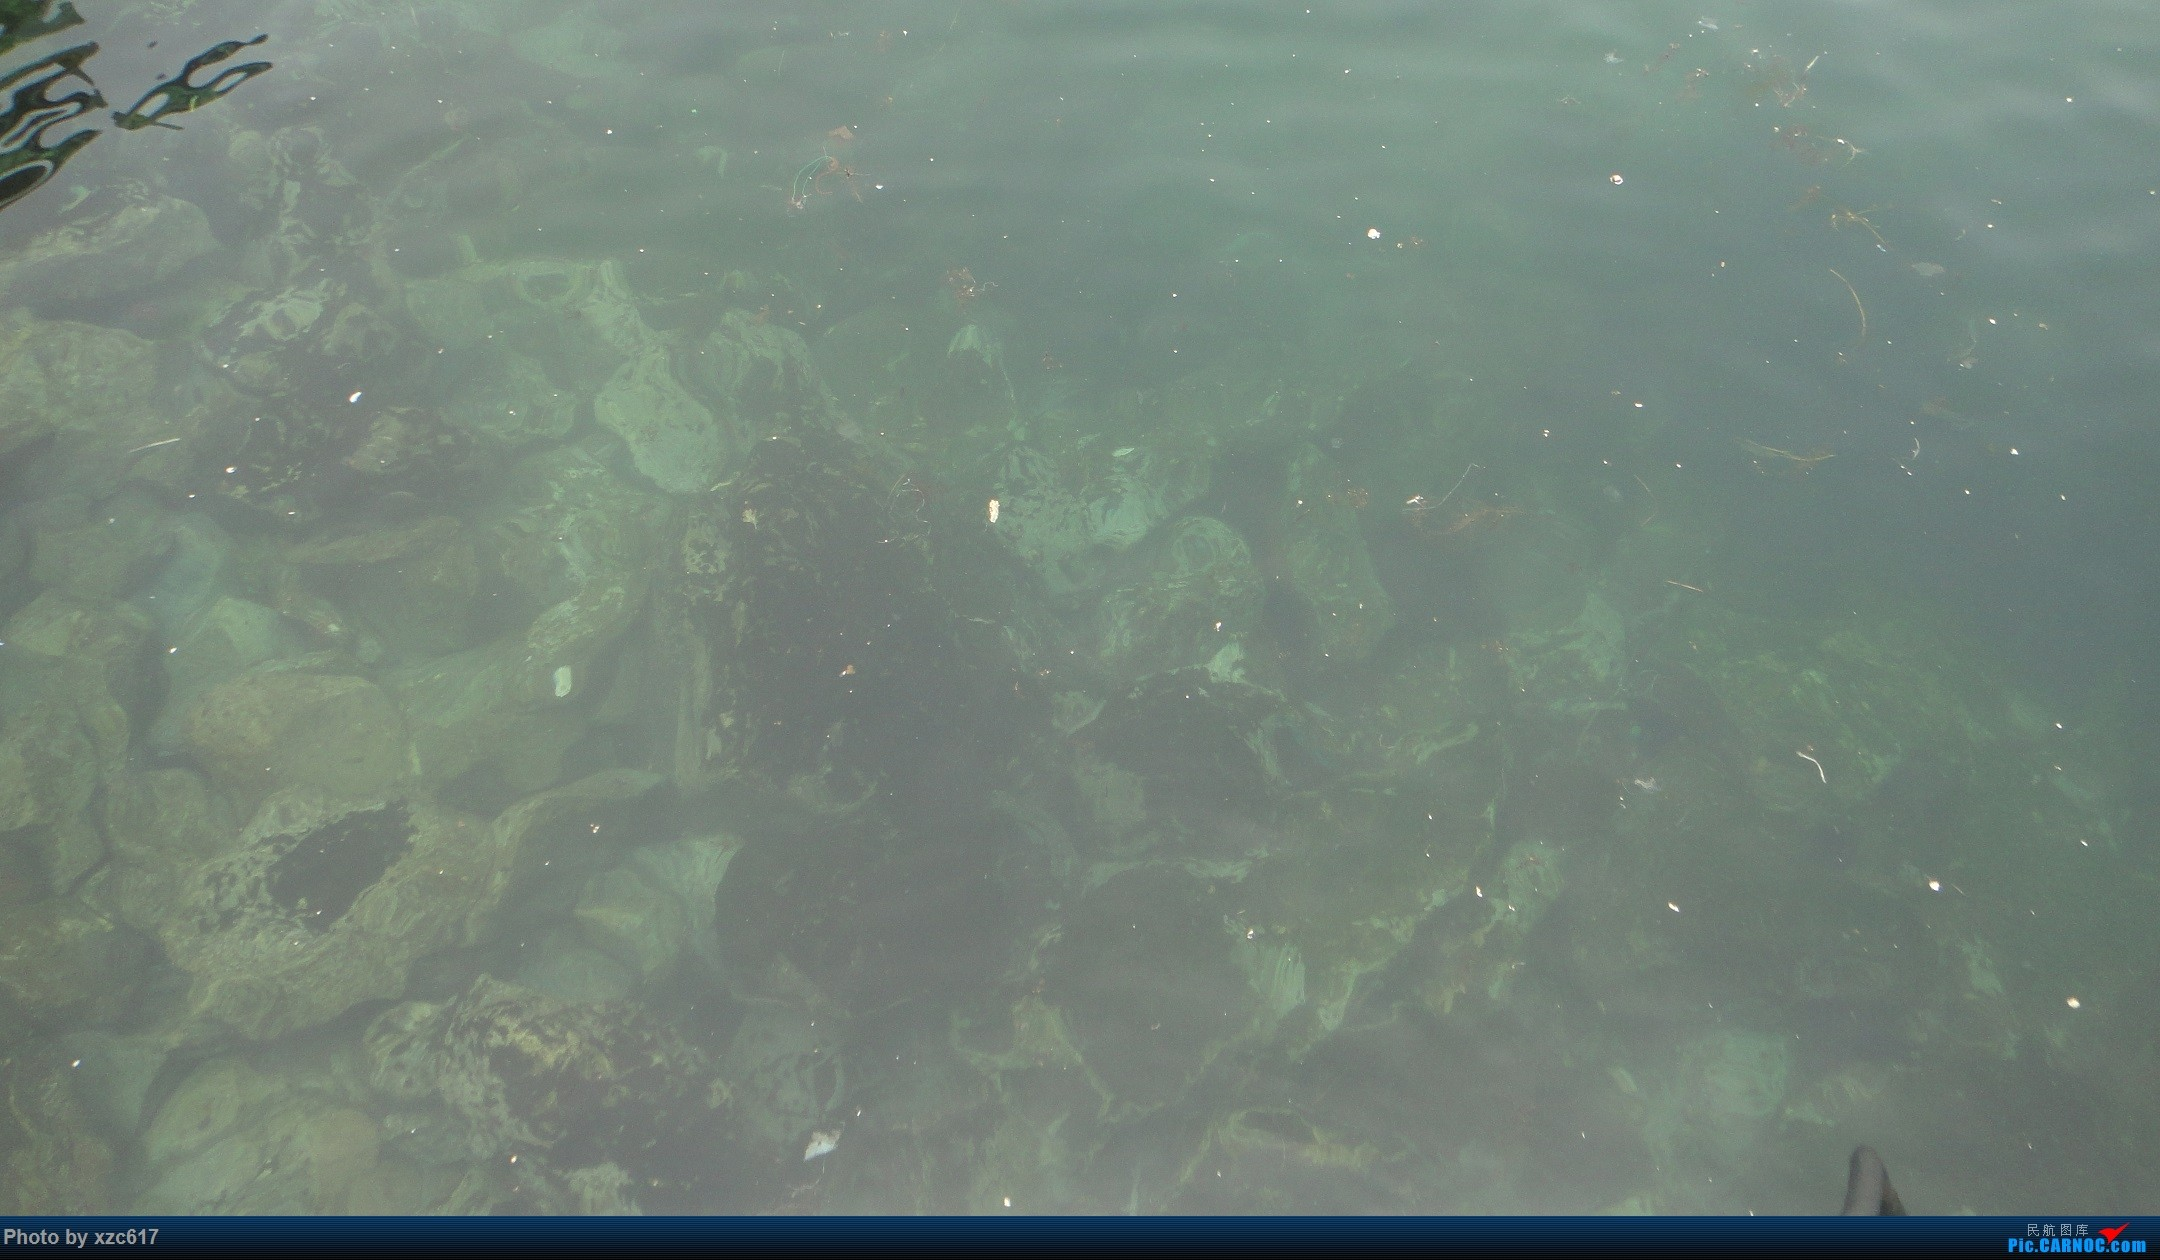 Re:[原创][xzc617的飞行游记 NO.1] 由扬州到大连,平生第一次游海岛